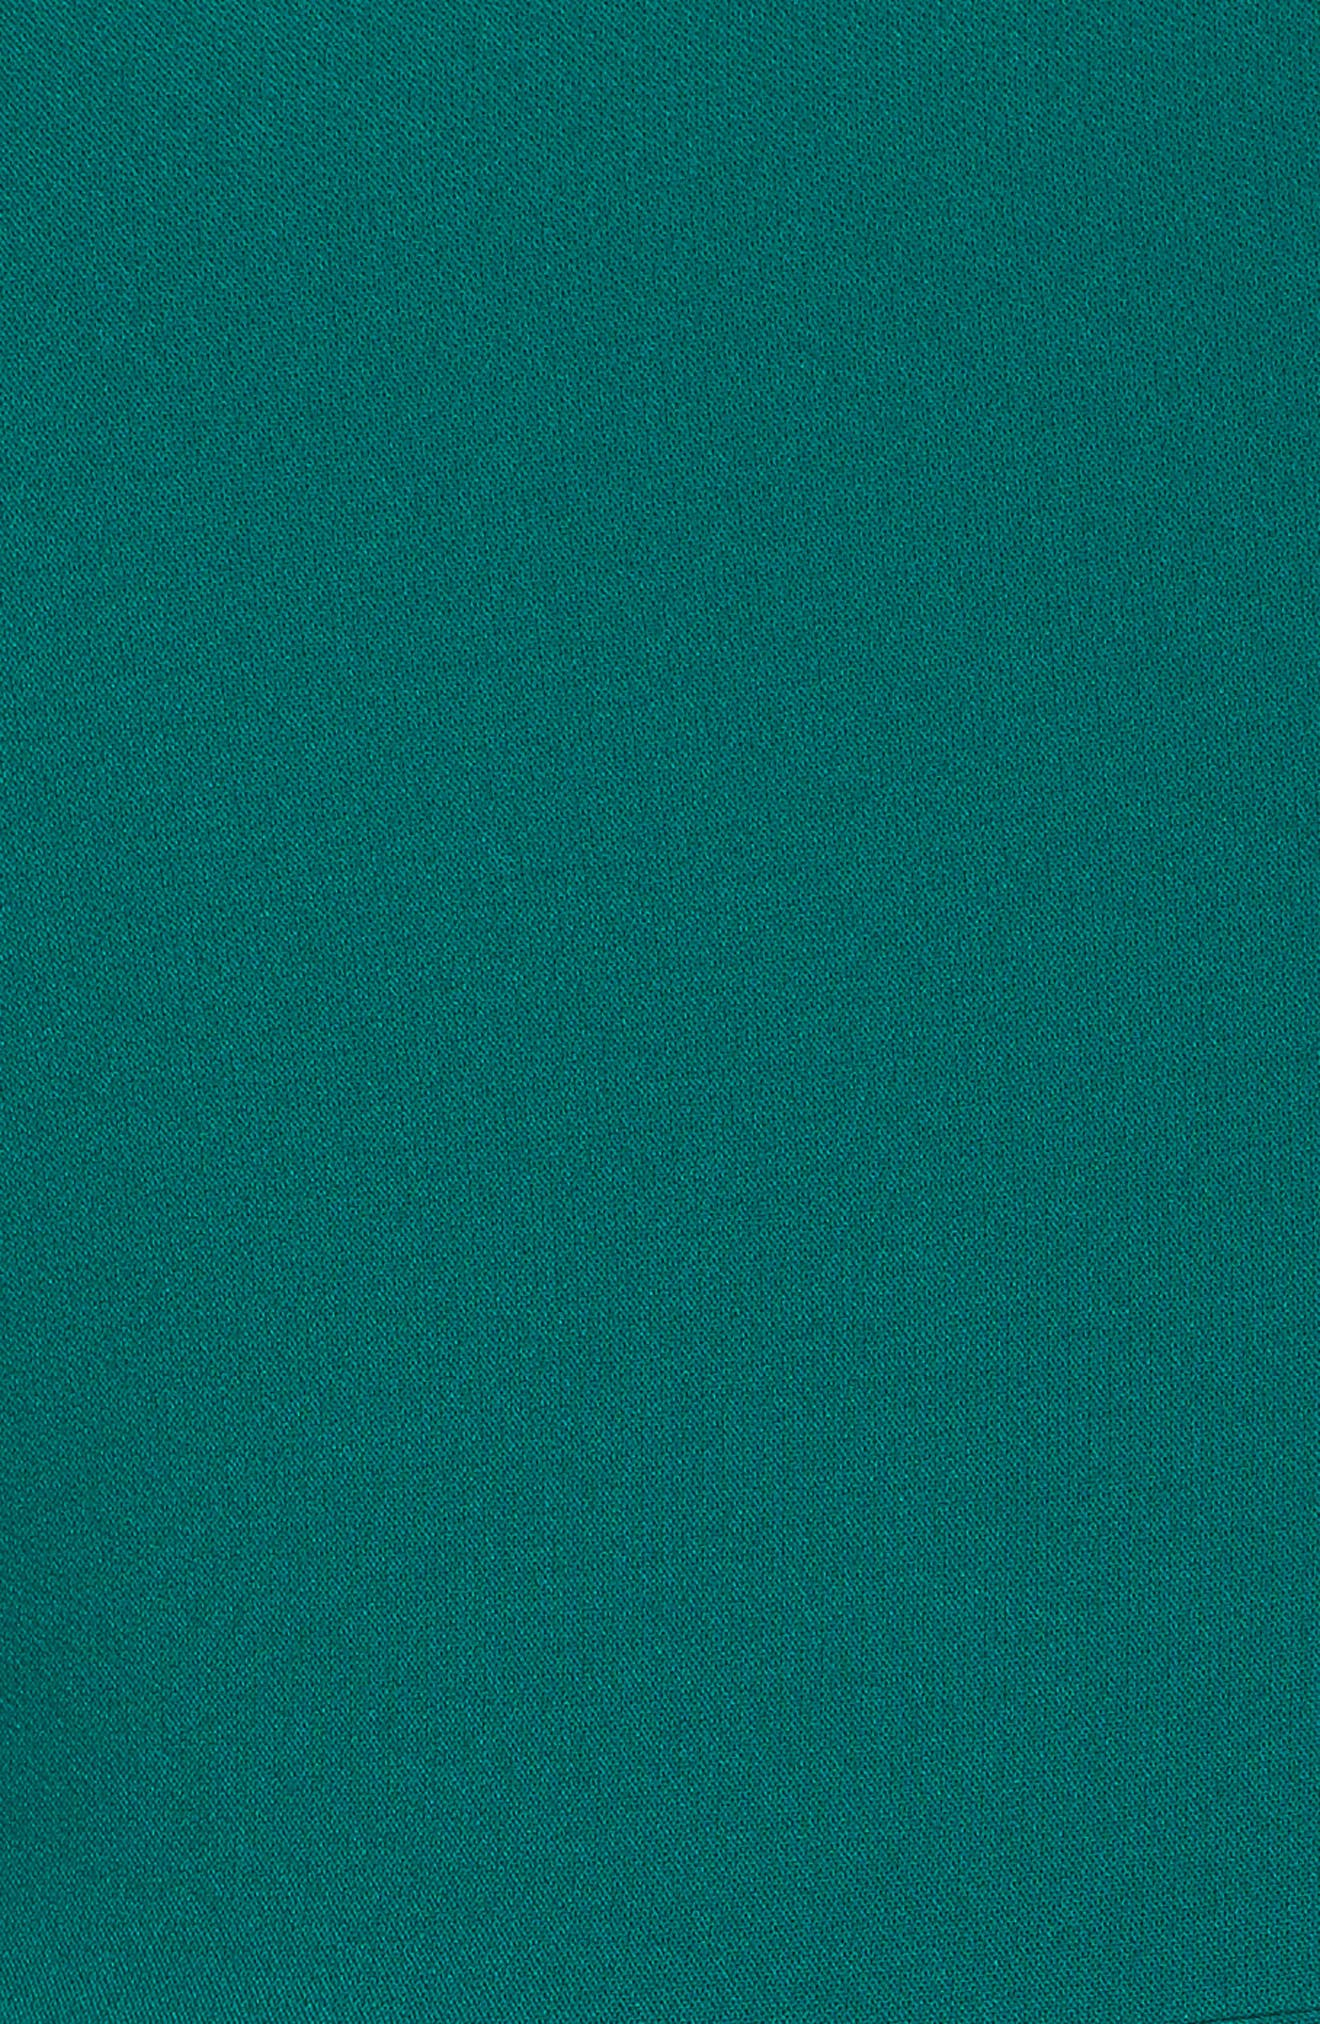 Envelope Neck with Button Sheath Dress,                             Alternate thumbnail 5, color,                             307